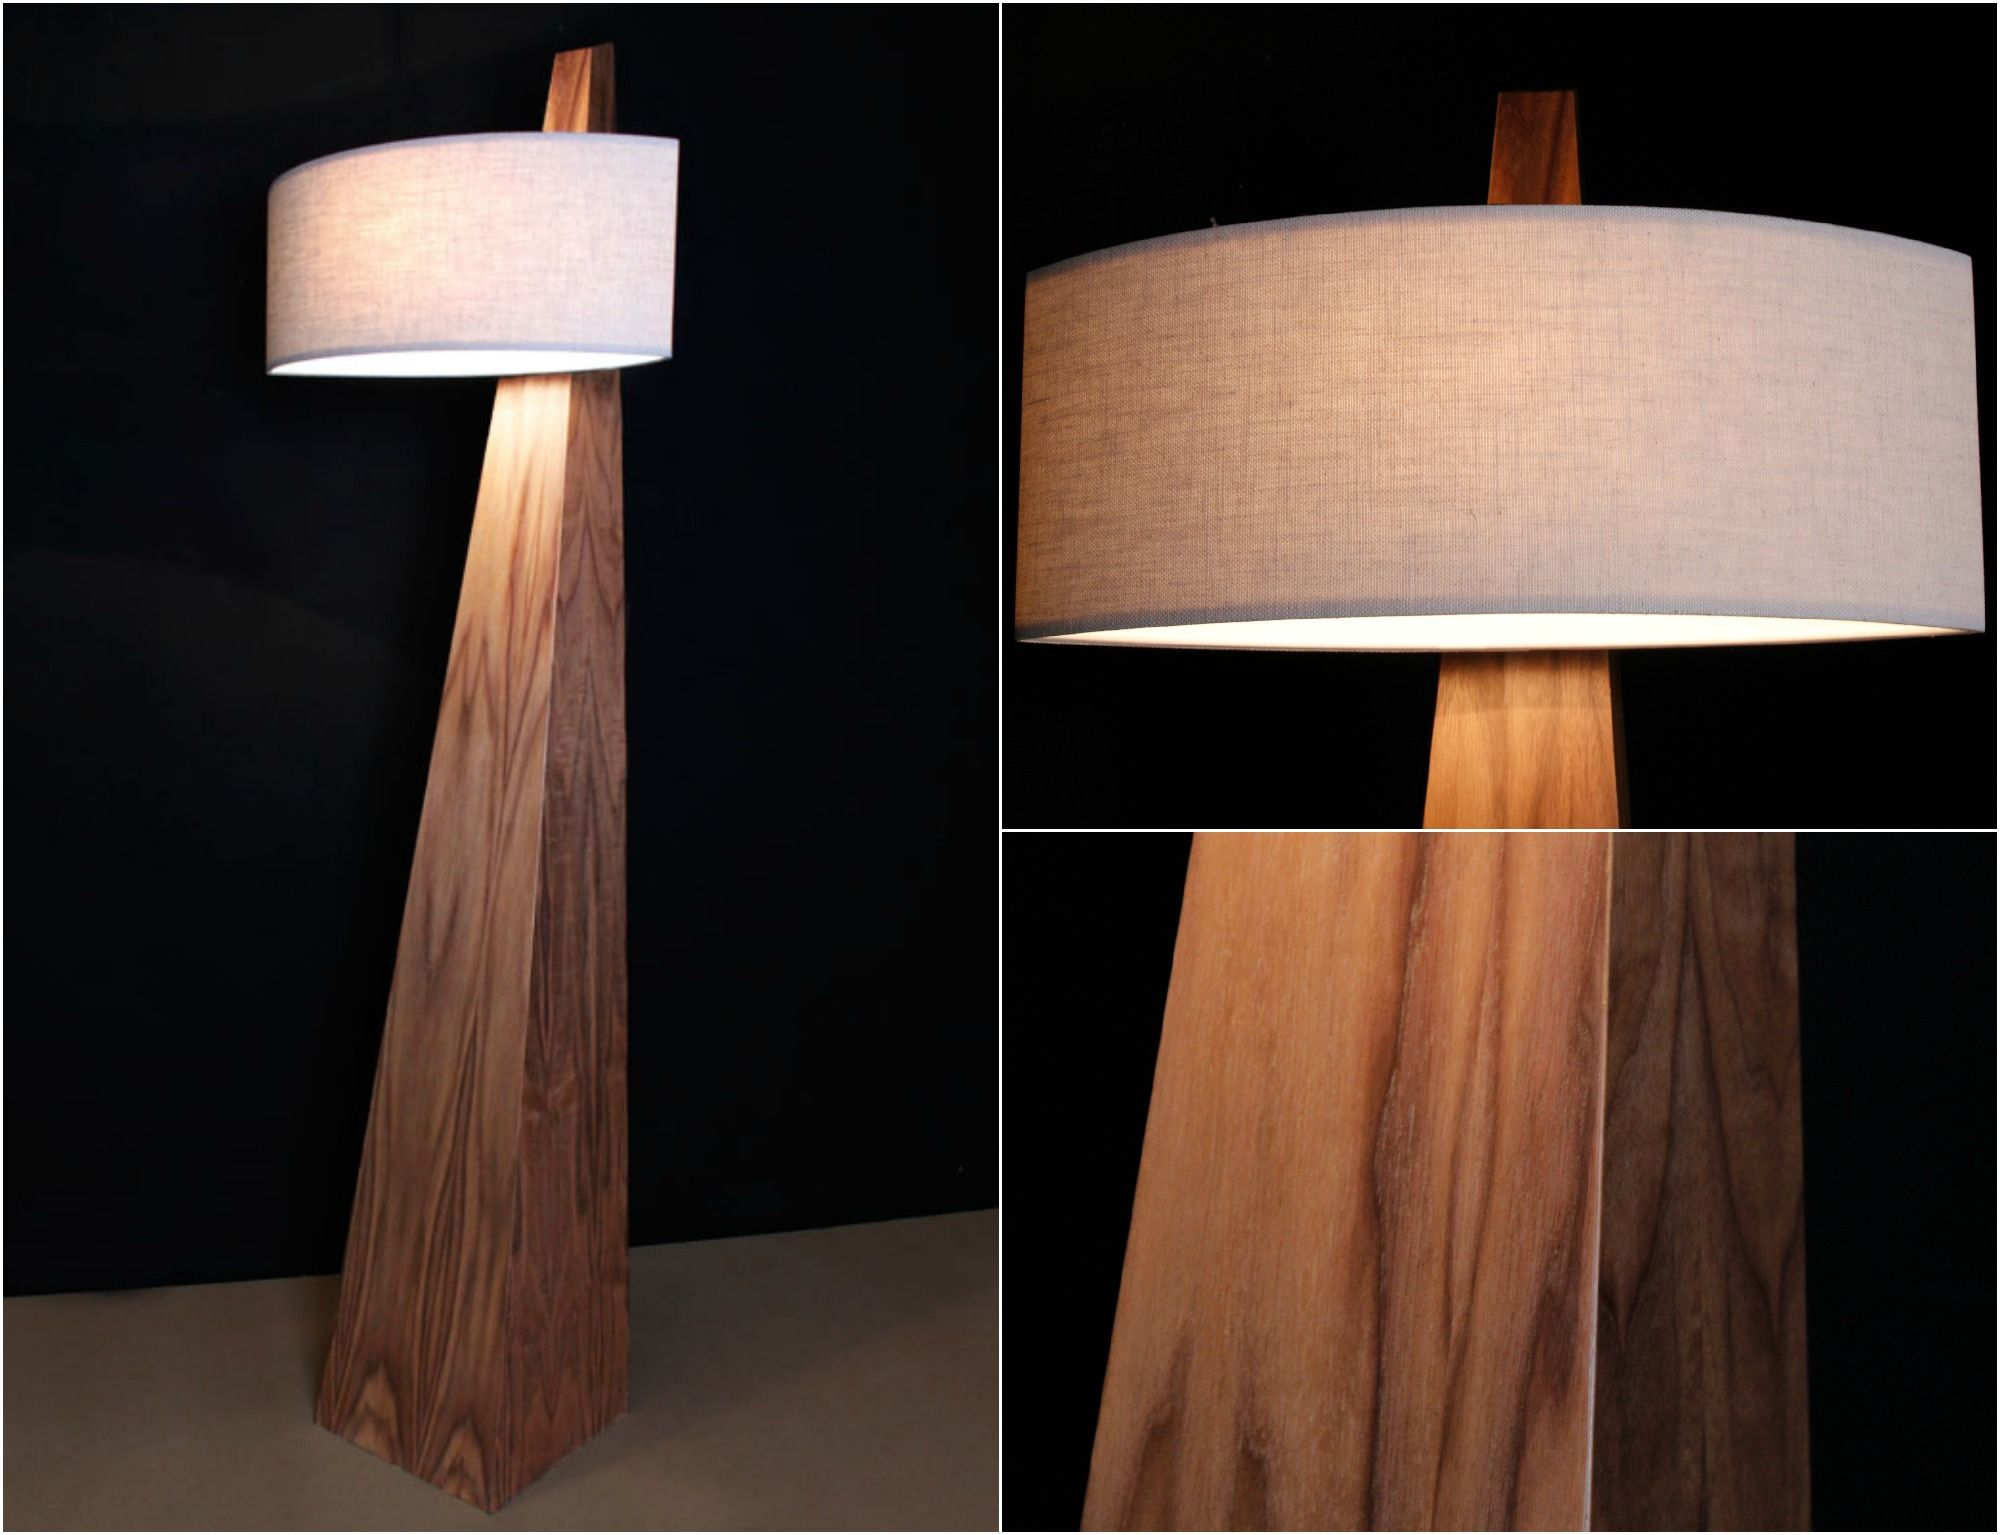 Pin On Bespoke Lighting By Chantelle